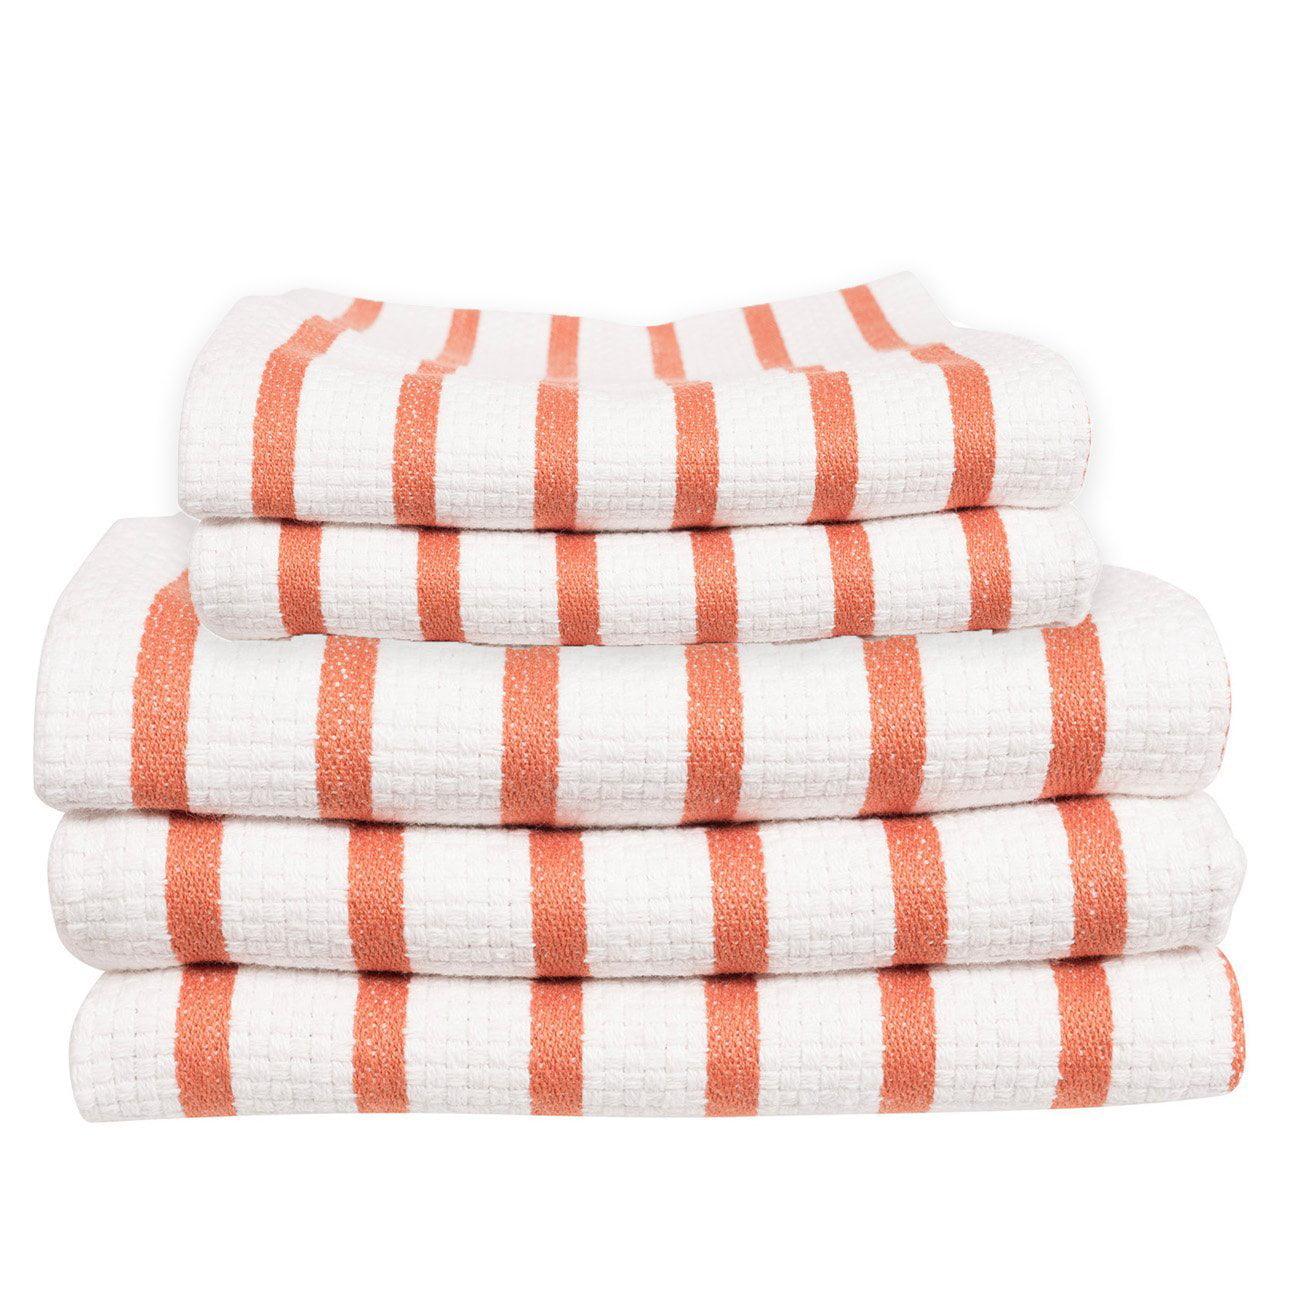 Basketweave Stripe Casserole Dish Towel & Cloth Set Of 5, Orange, Soft, comfortable feel By KAF Home by